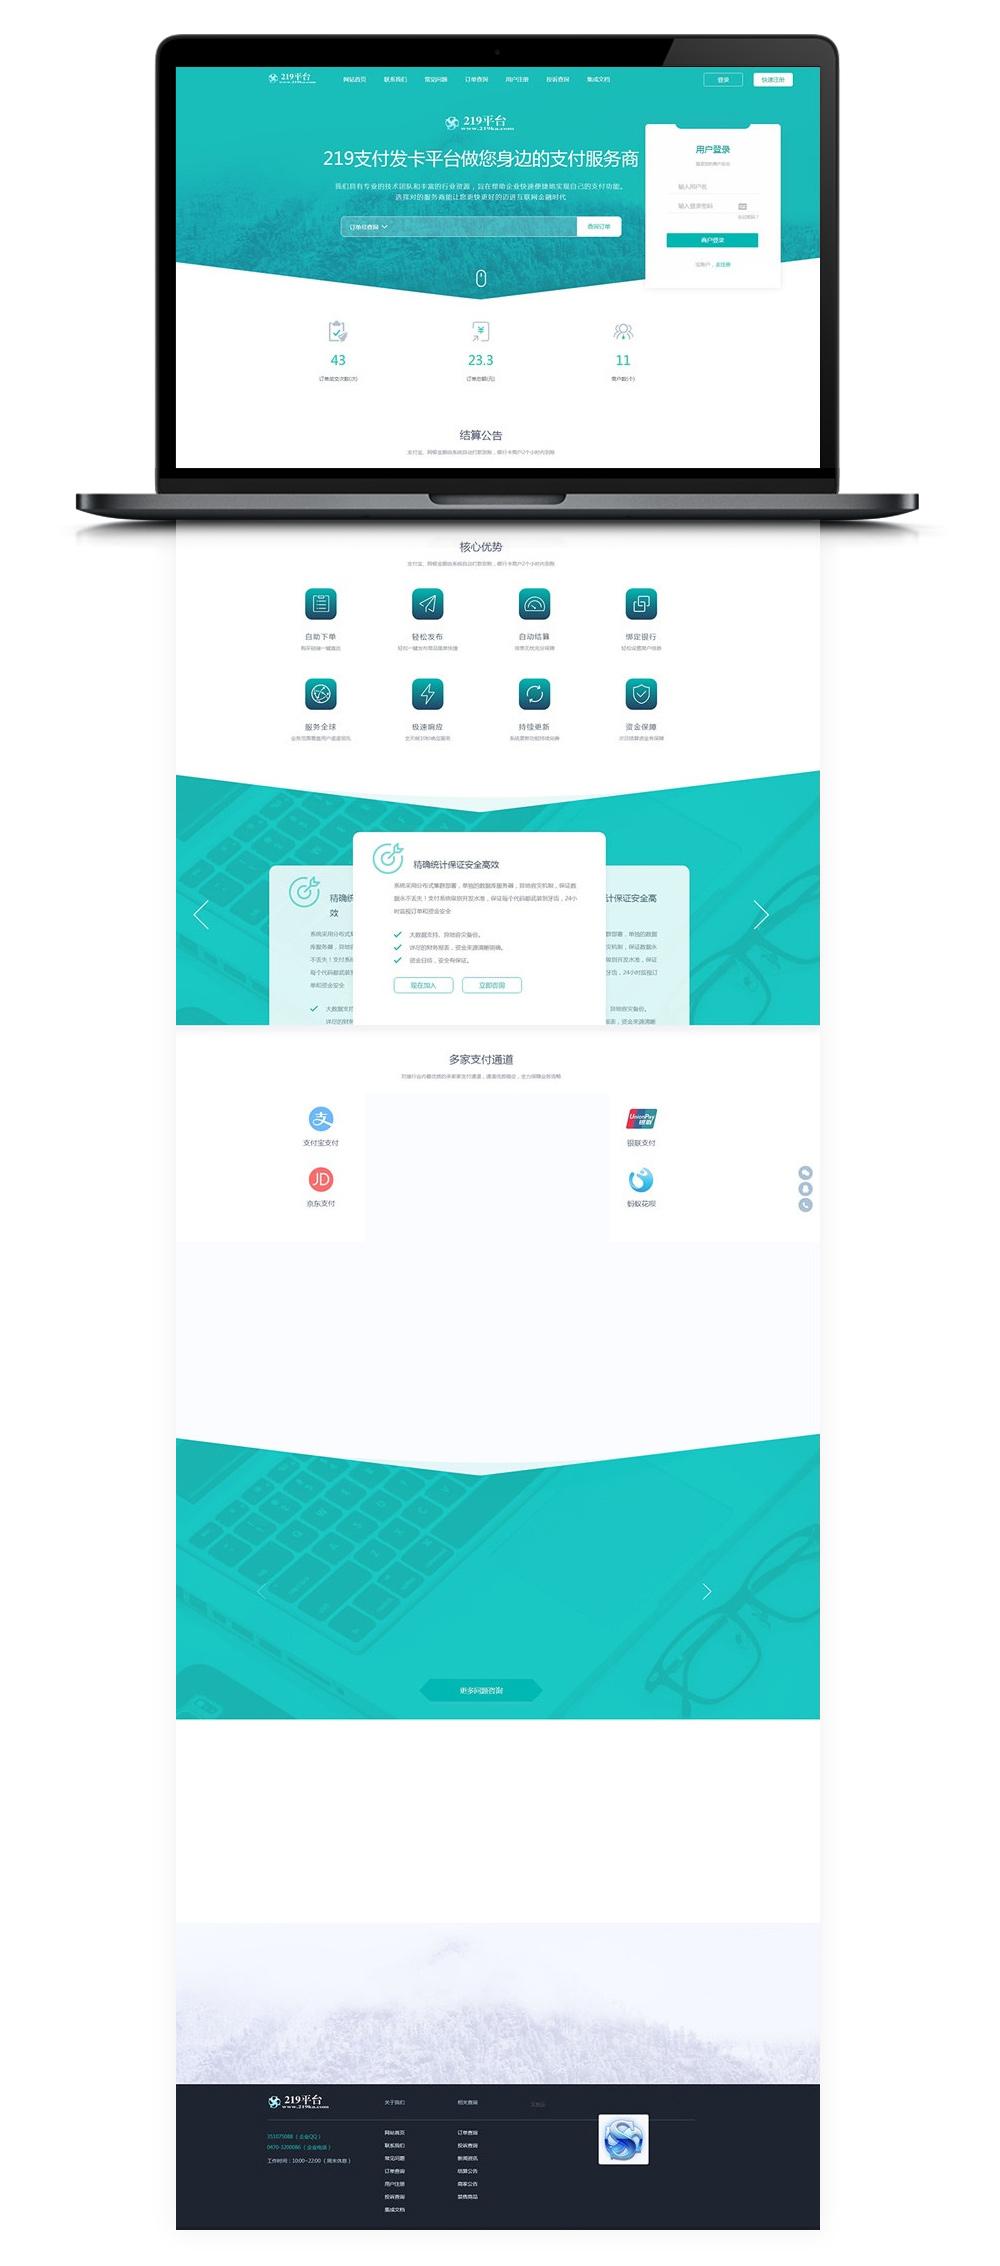 【API代理自动发卡系统】2020新春首发代理发卡网站源码 这套界面算得上是目前最大气最漂亮的发卡平台[带详细搭建教程]-找主题源码